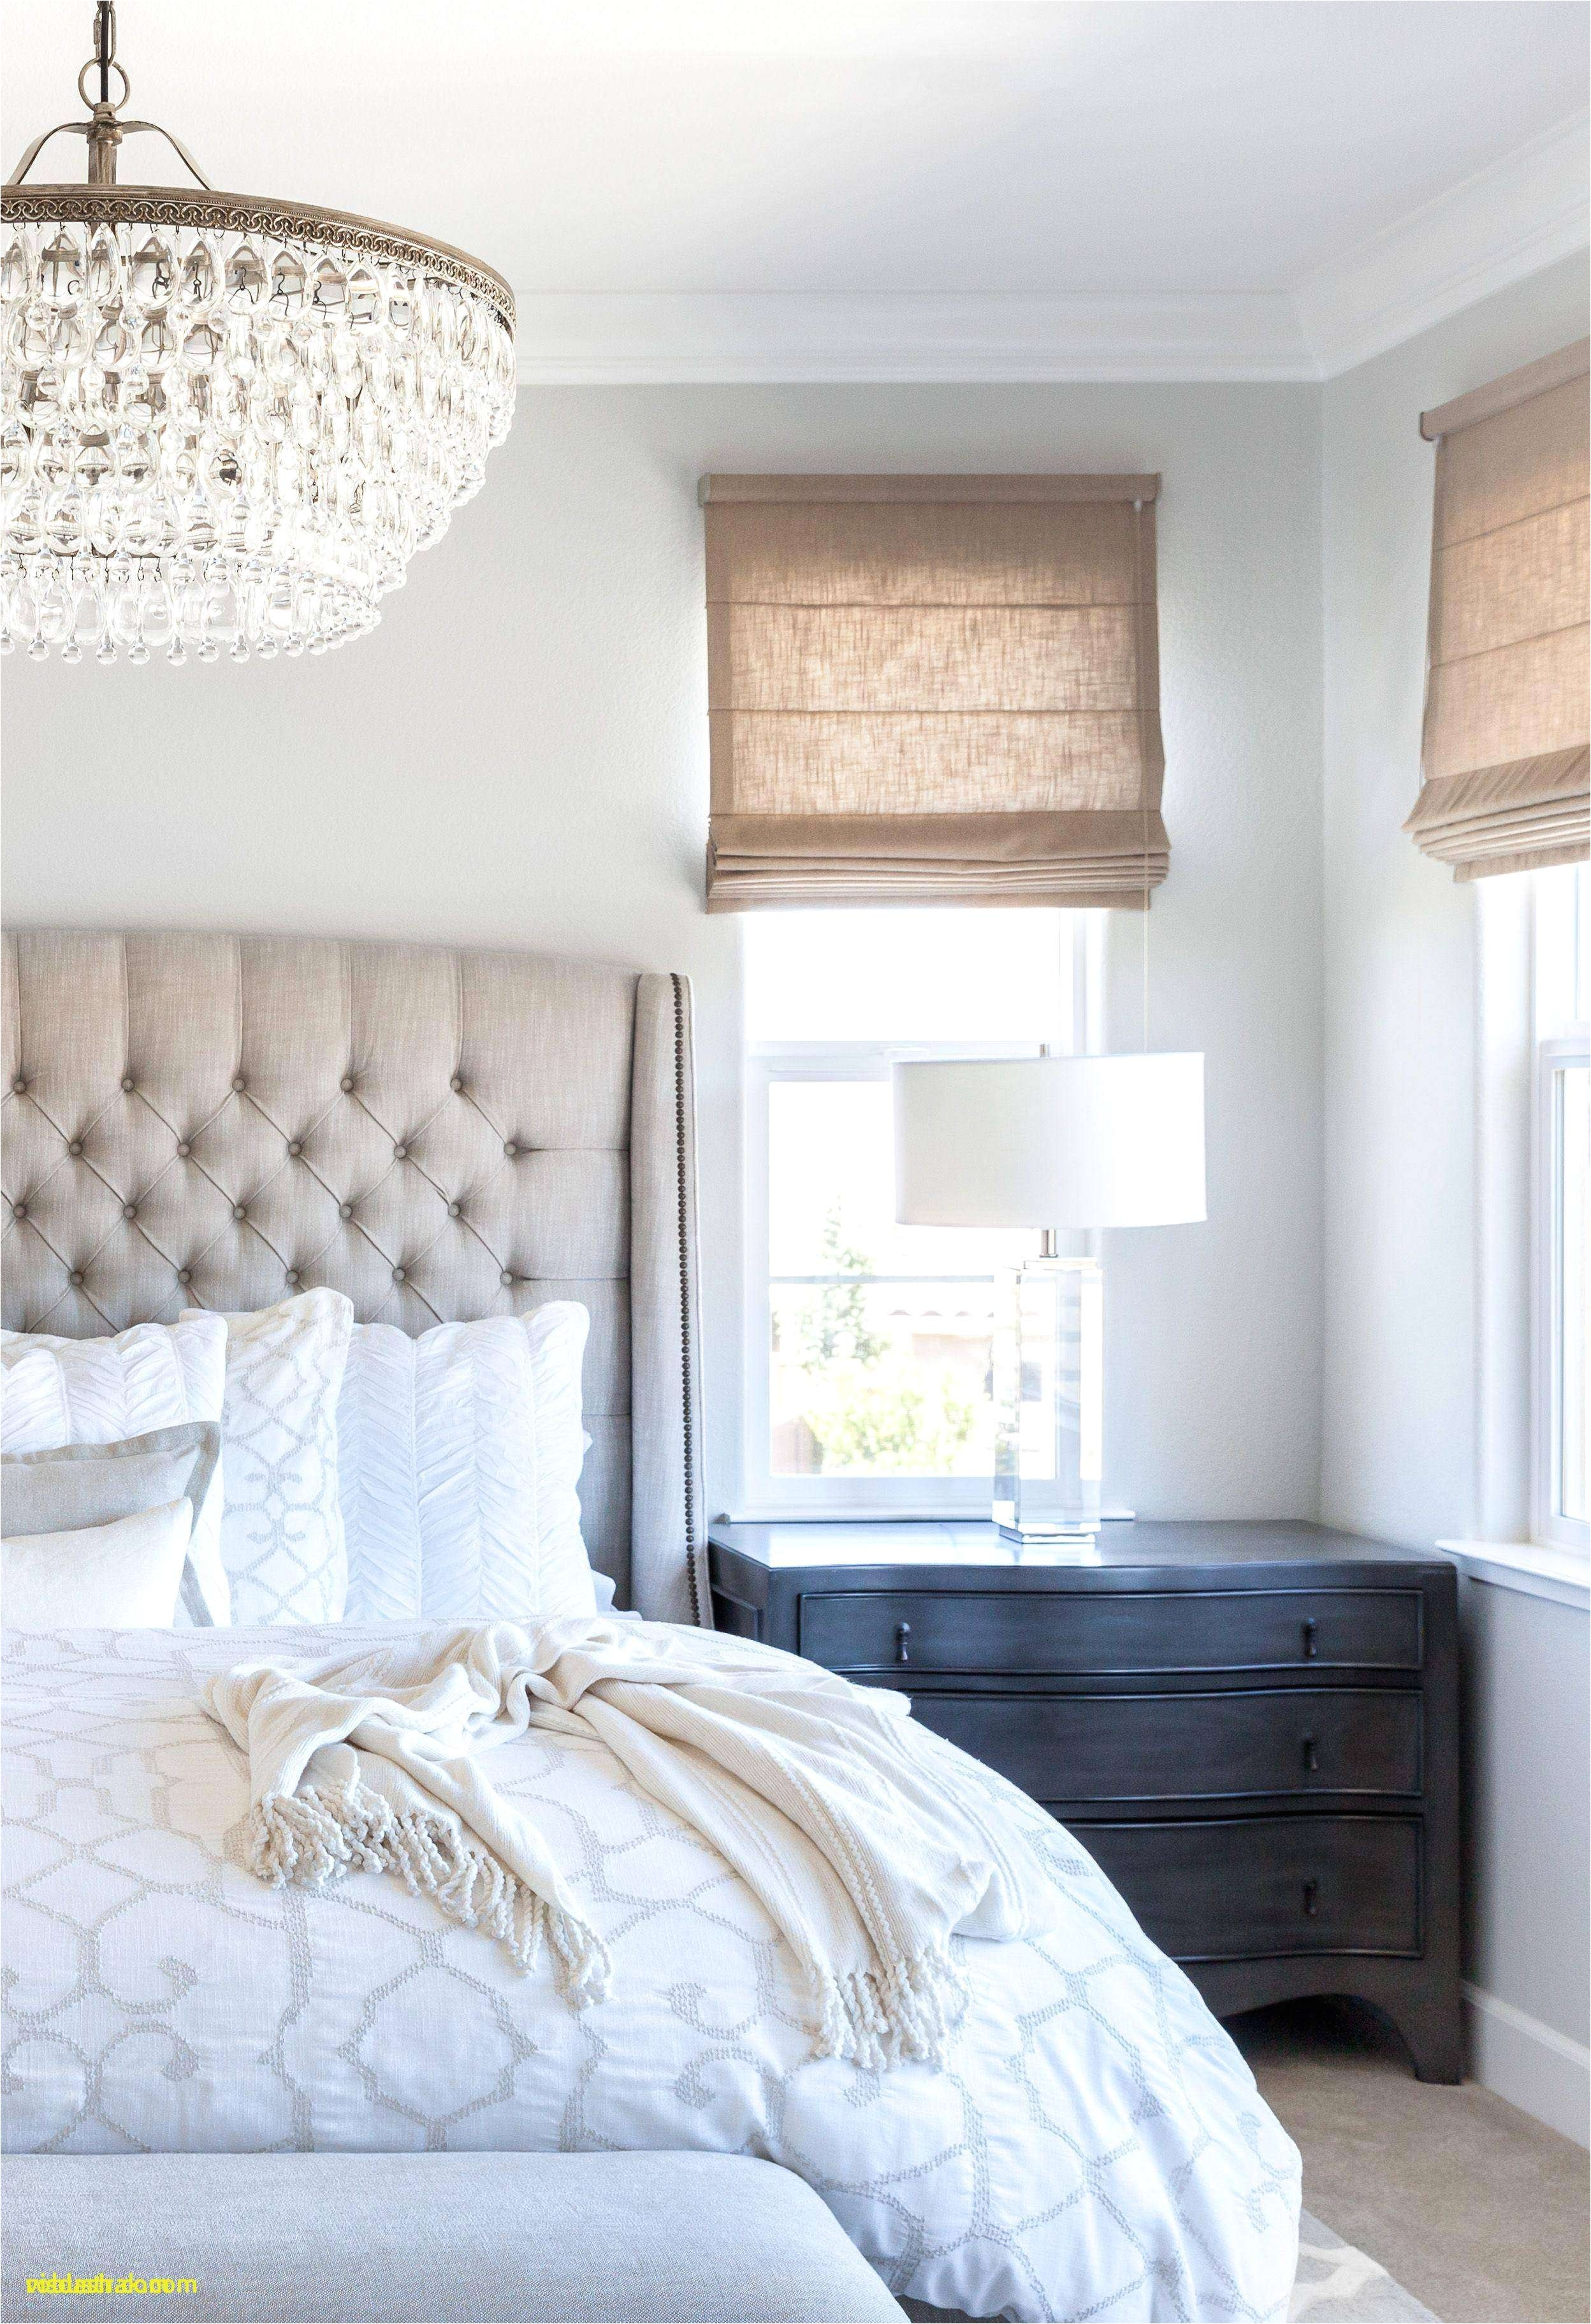 Astounding Luxury Bedrooms for Girls